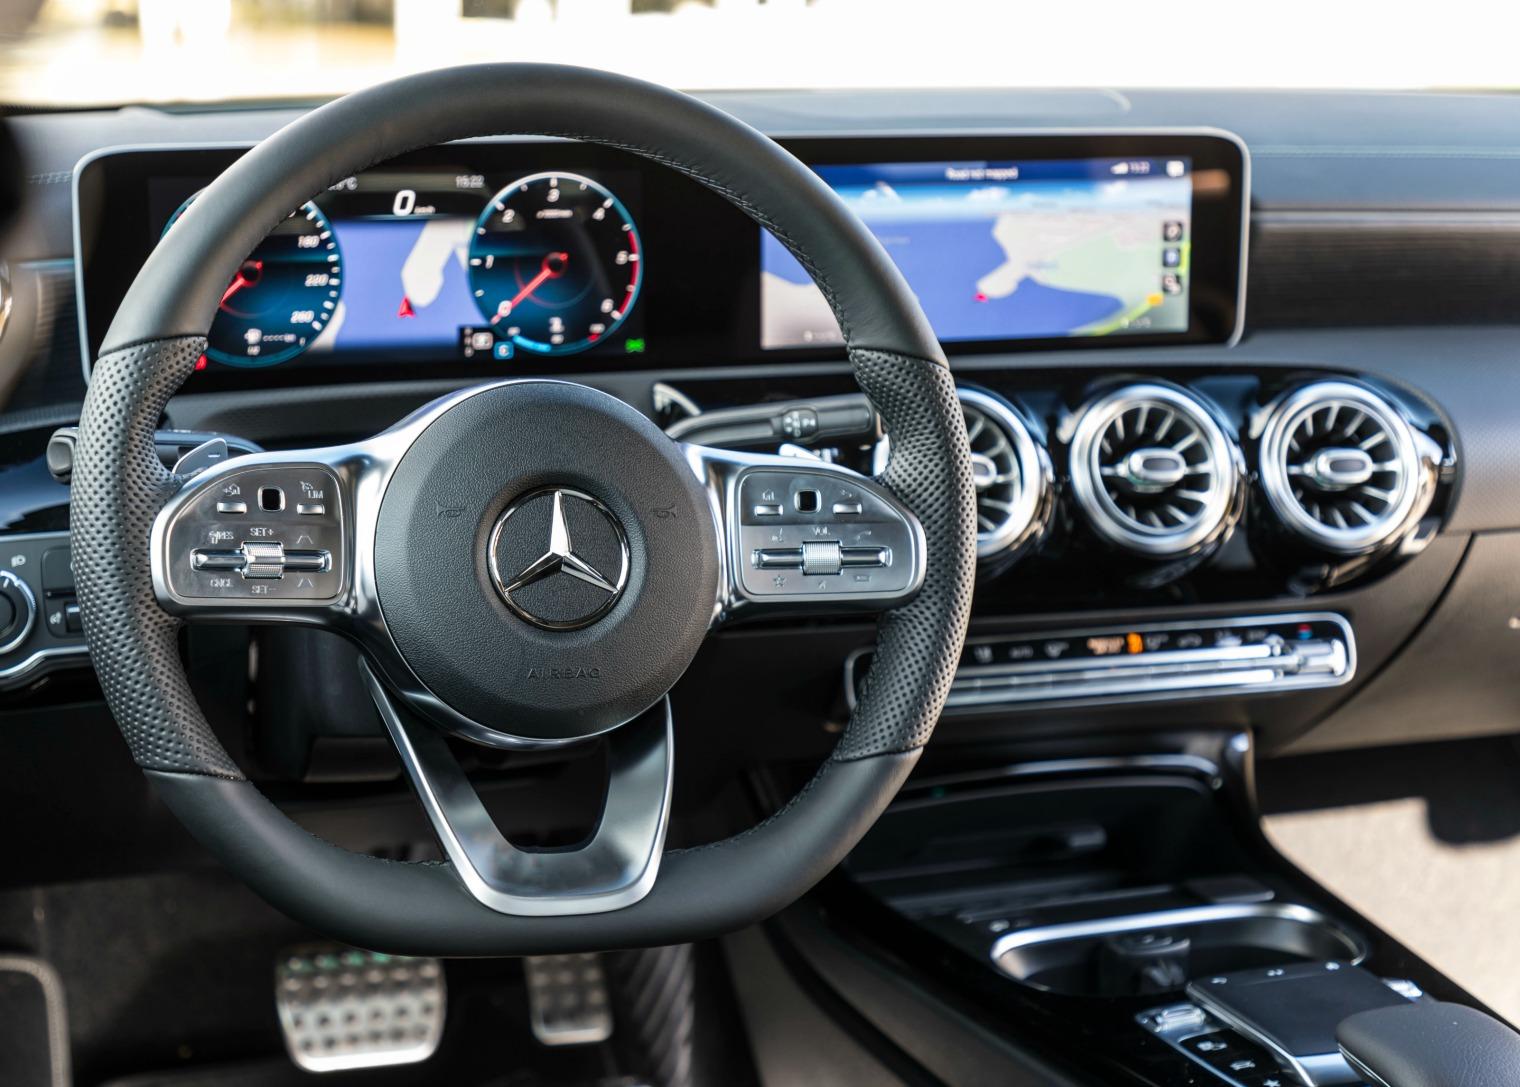 Interni nuova Mercedesl CLA Coupe